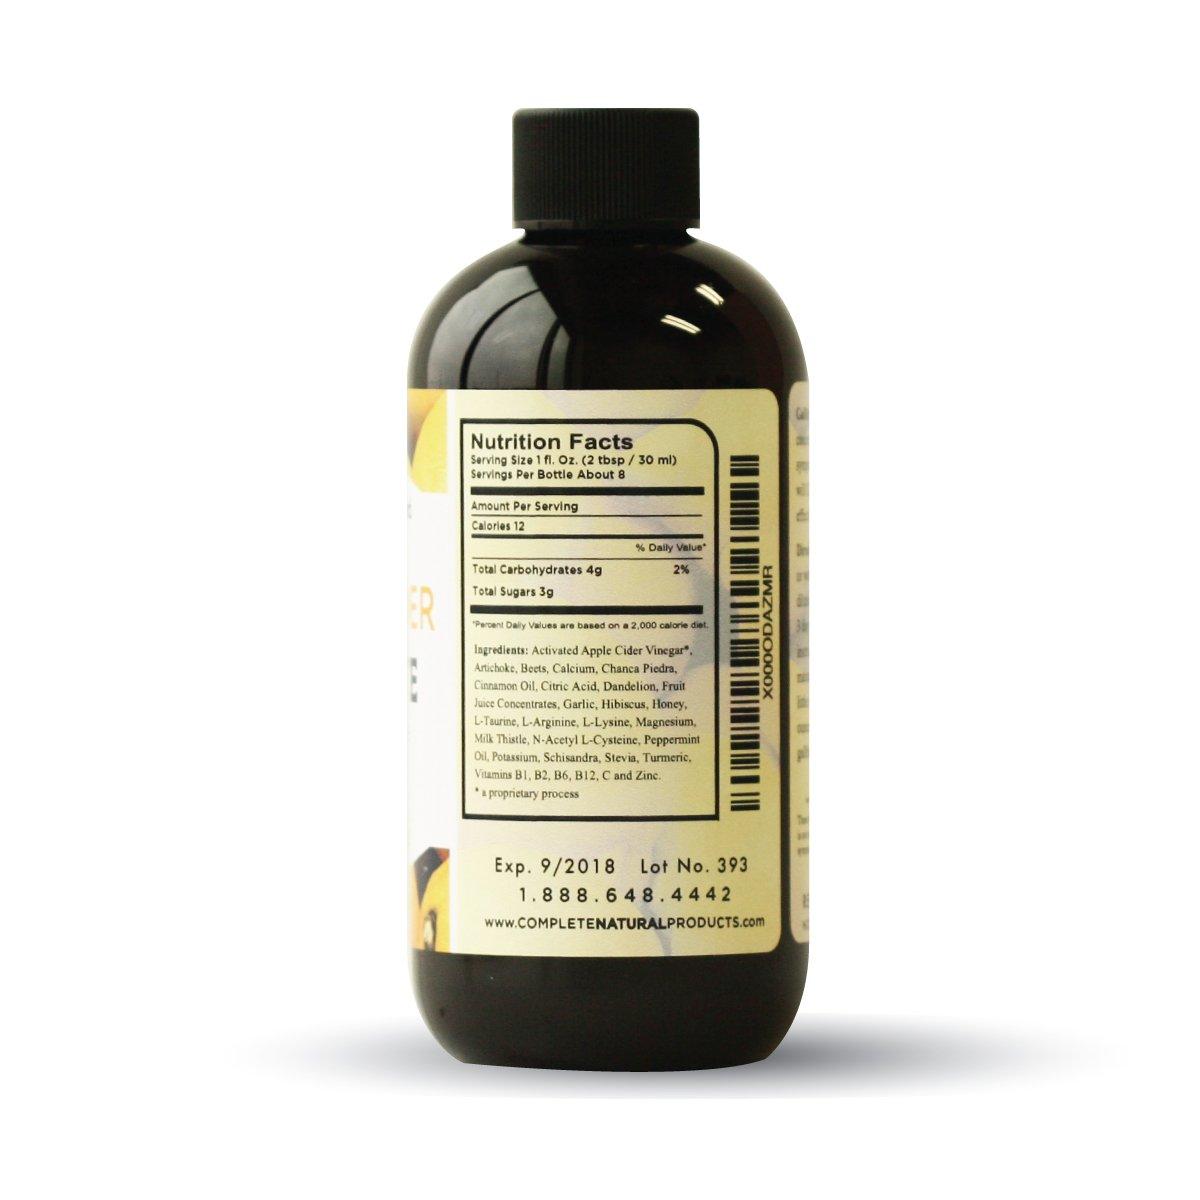 Gallbladder Complete 8oz Organic Liquid Concentrate